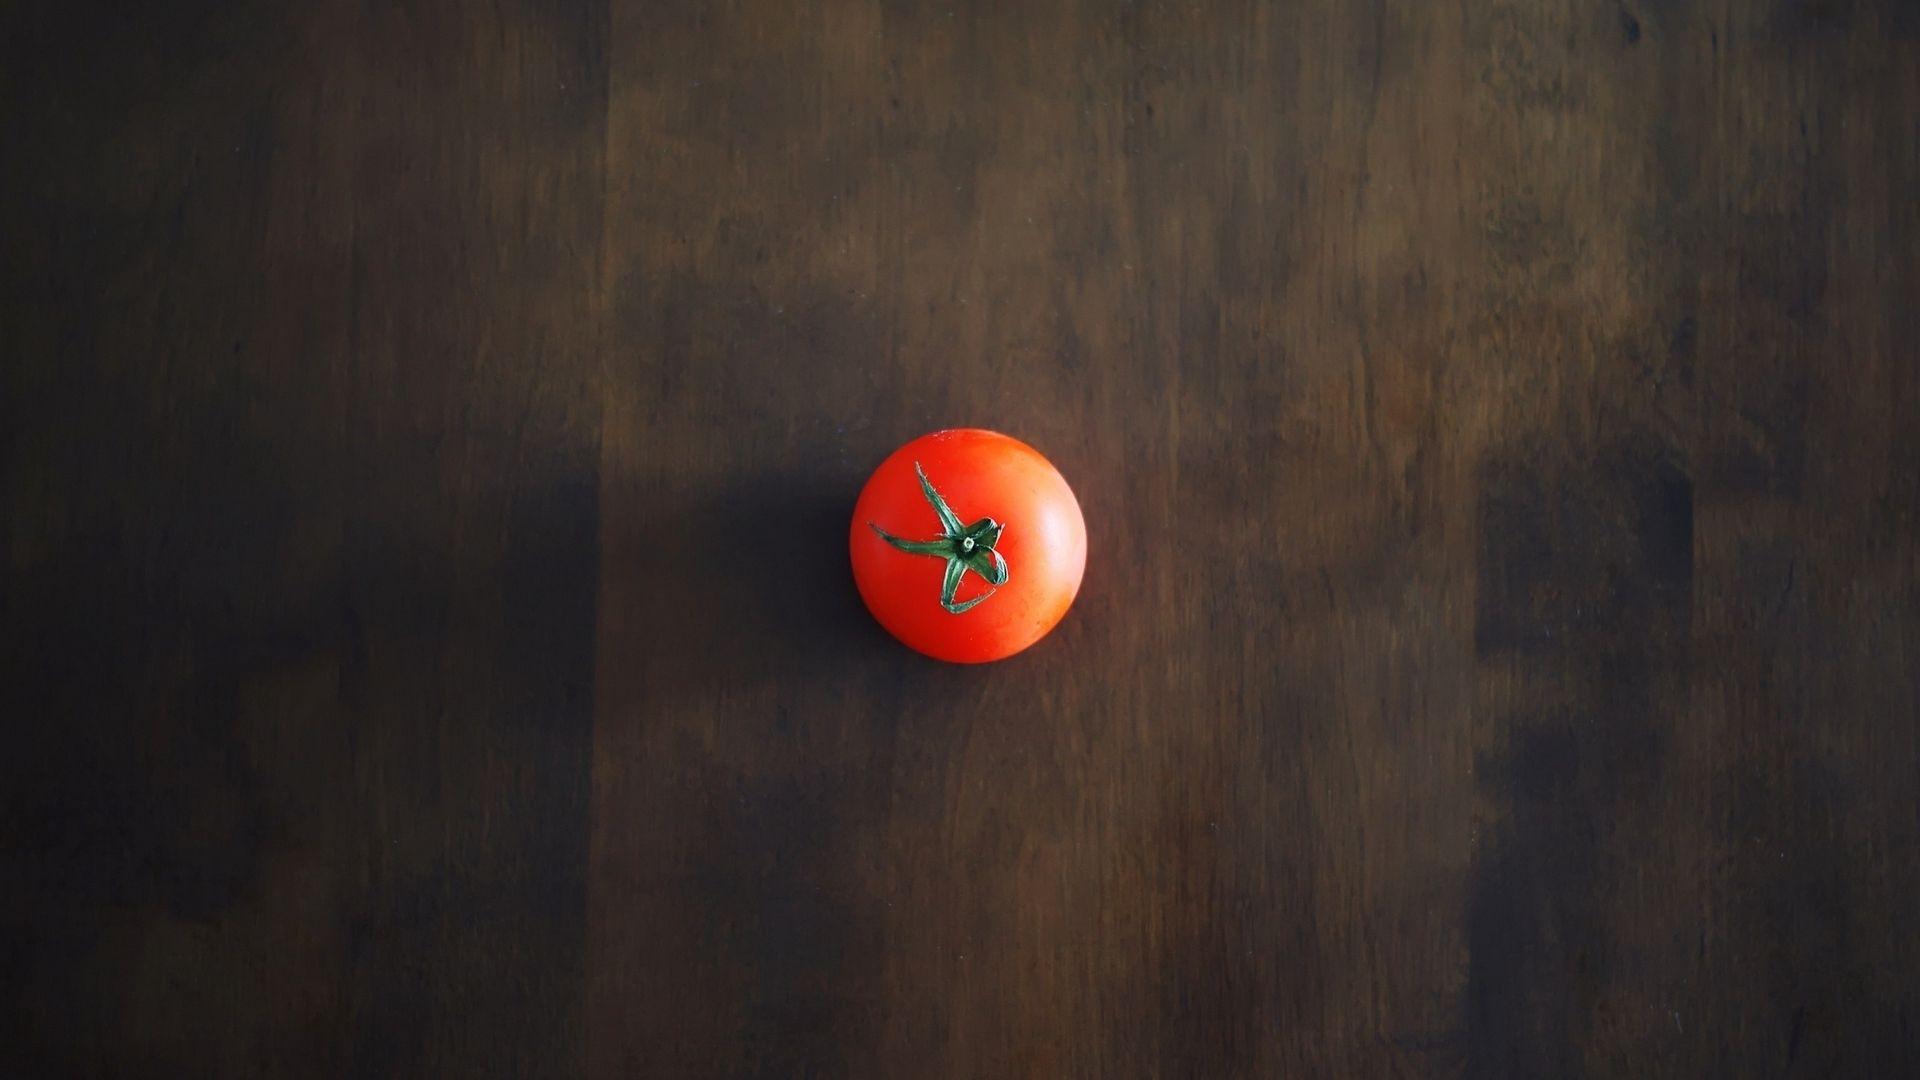 Minimalism Tomato Red Table Wallpaper - 1920x1080